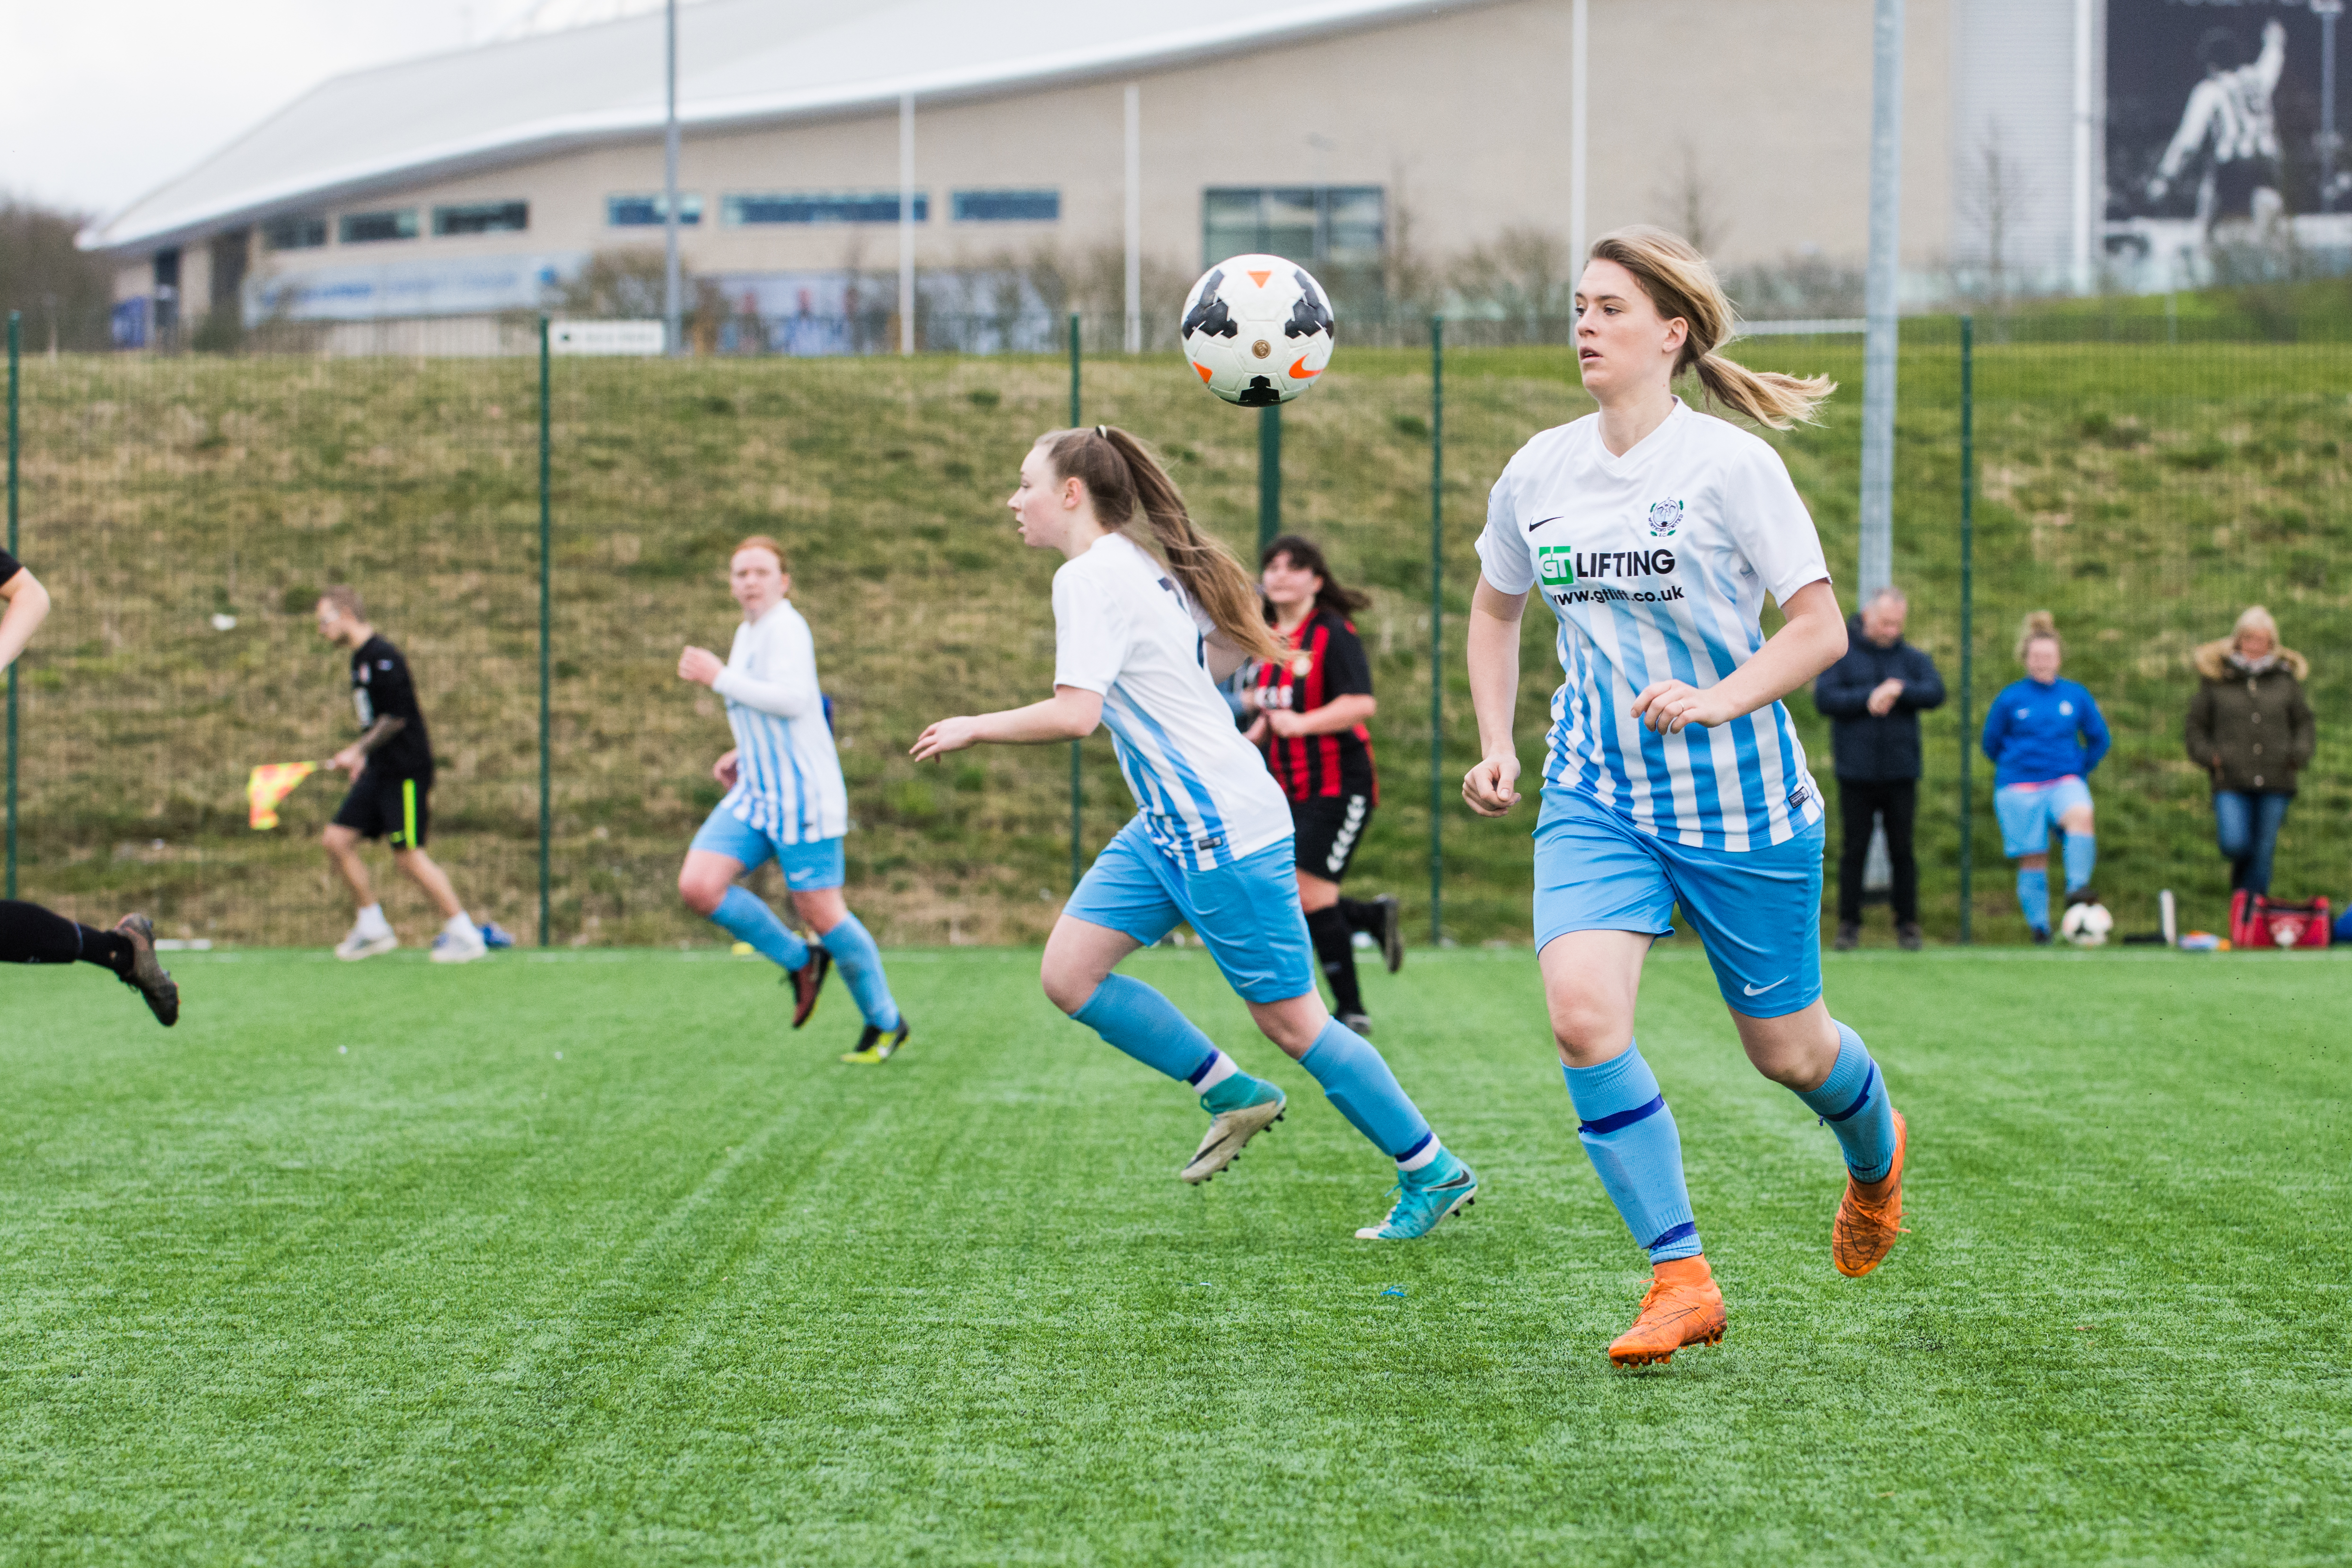 DAVID_JEFFERY Saltdean Utd Ladies FC vs Worthing Utd Ladies FC 11.03.18 56